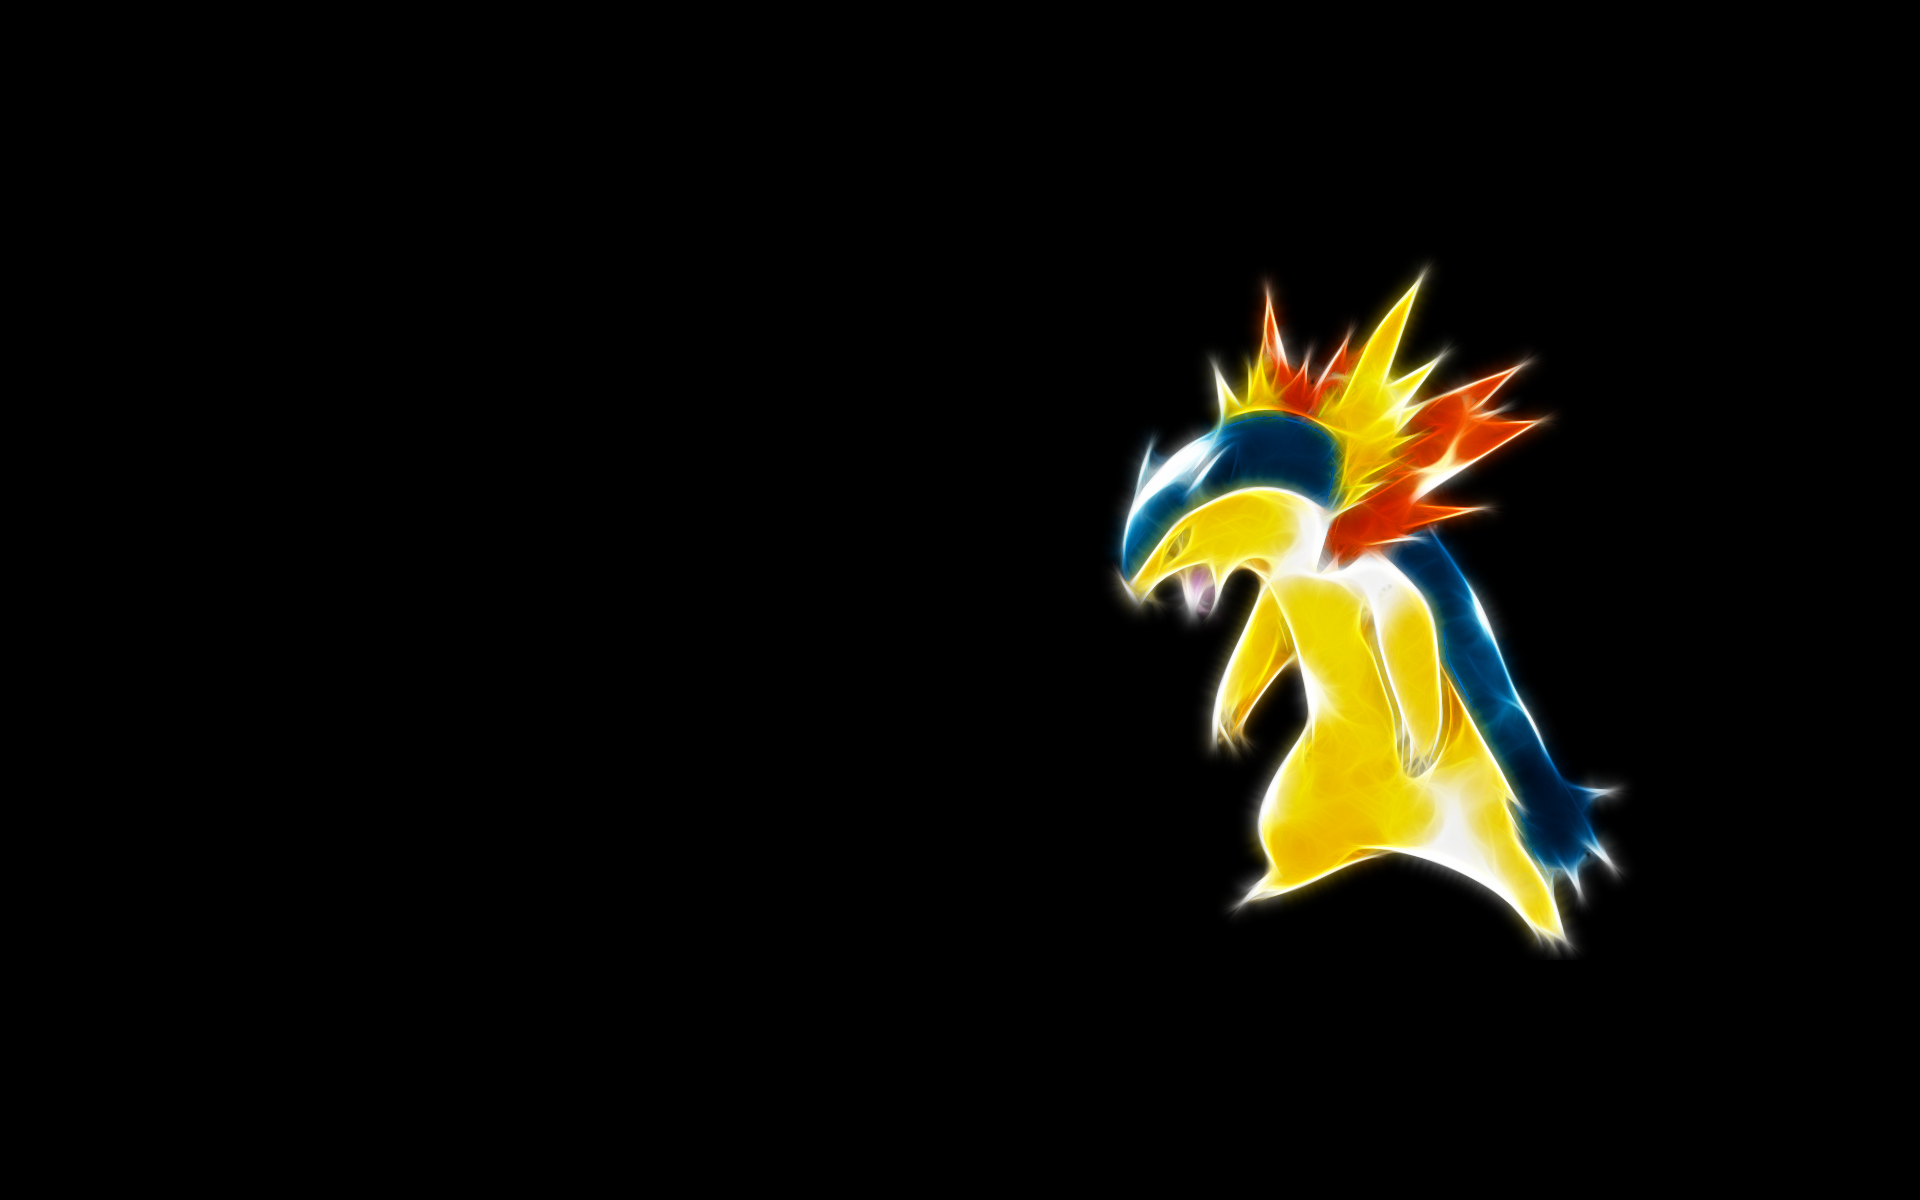 25 Cool Pokemon Wallpapers HD 1920x1200